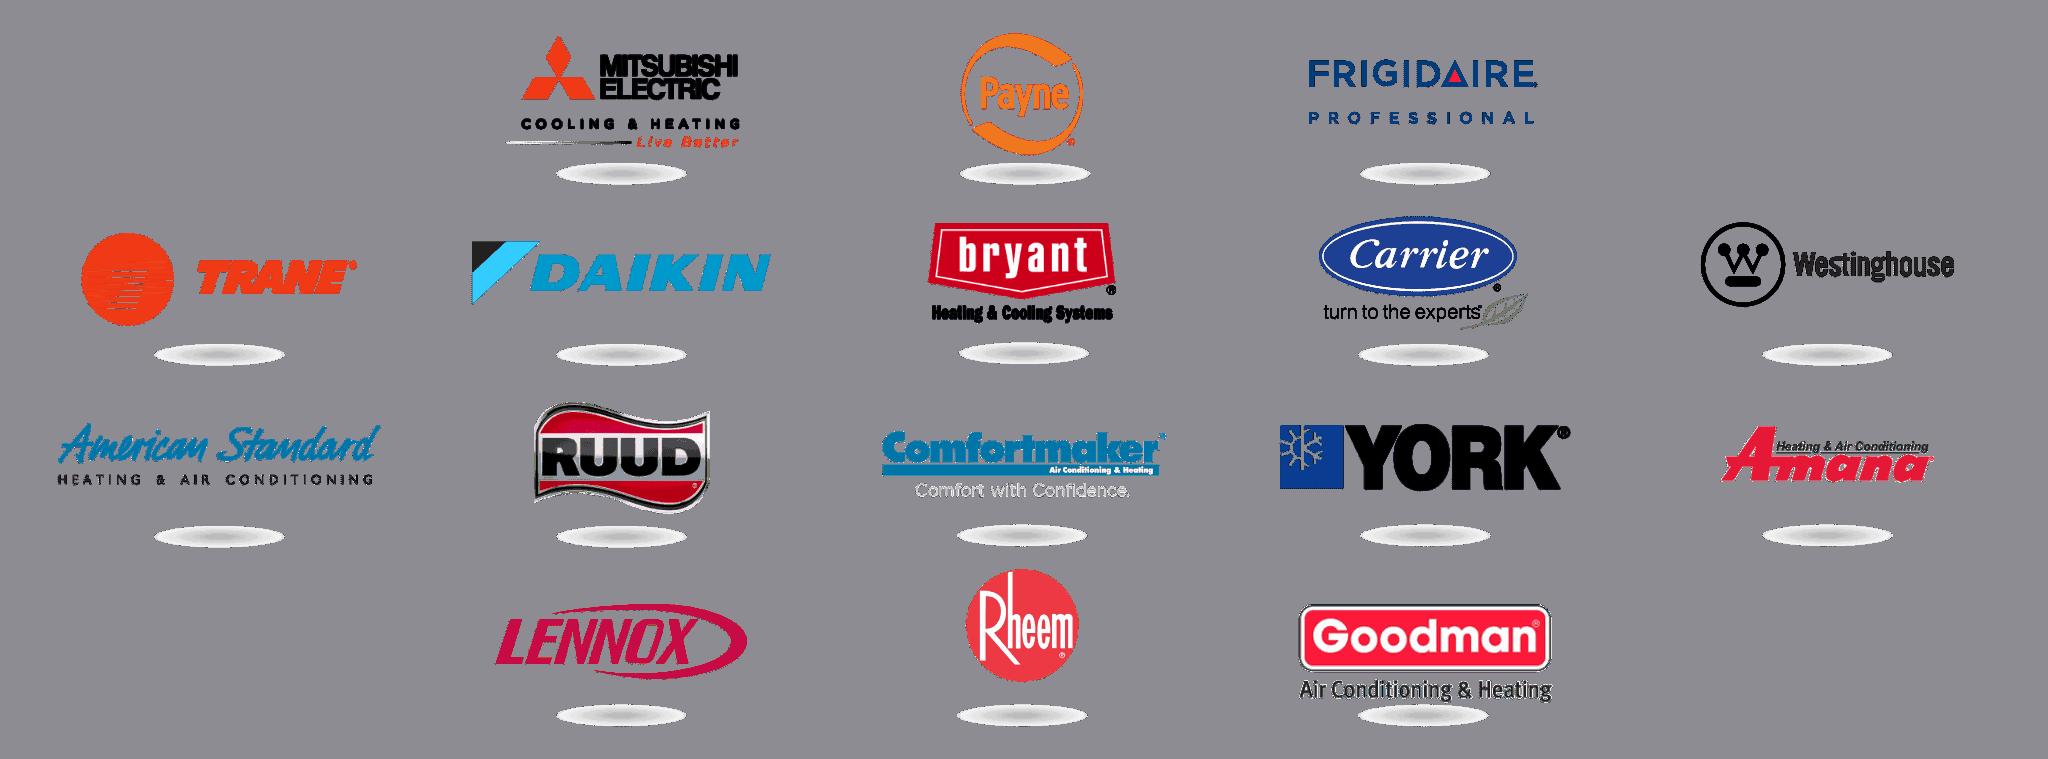 We service all HVAC brands.